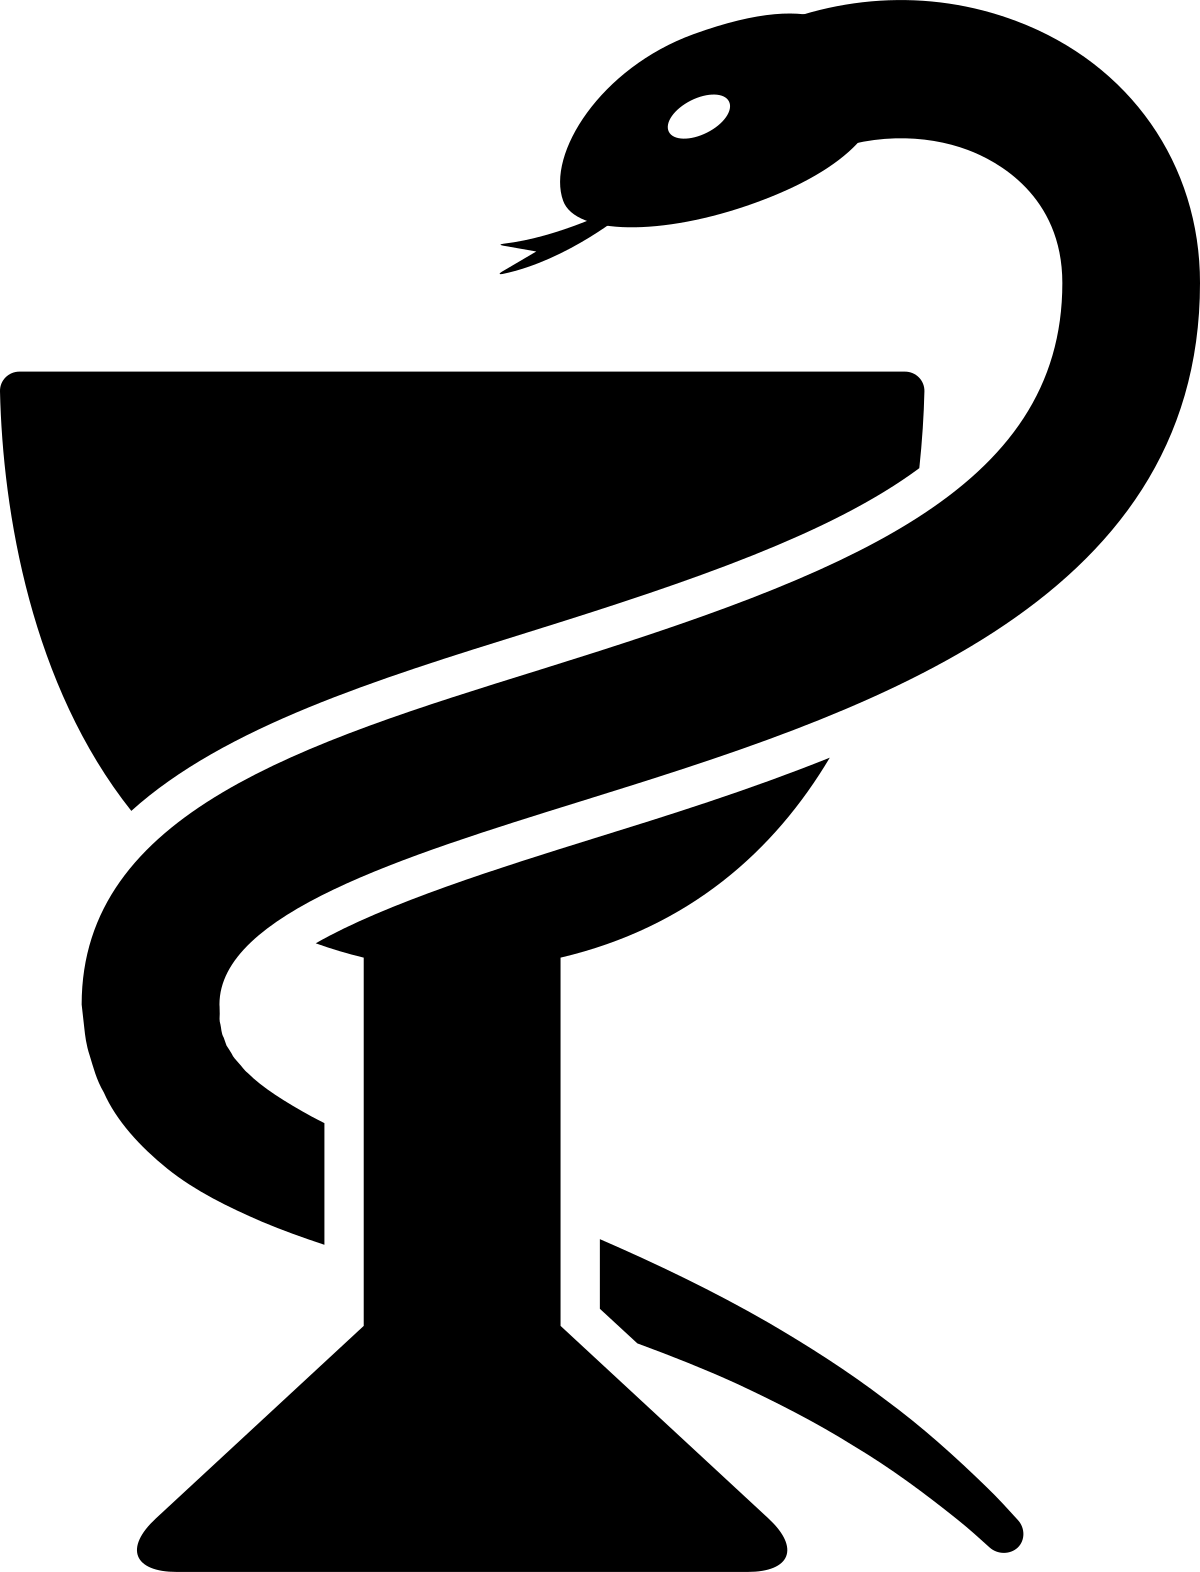 Bowl of hygieia wikipedia. Lobster clipart symbol louisiana